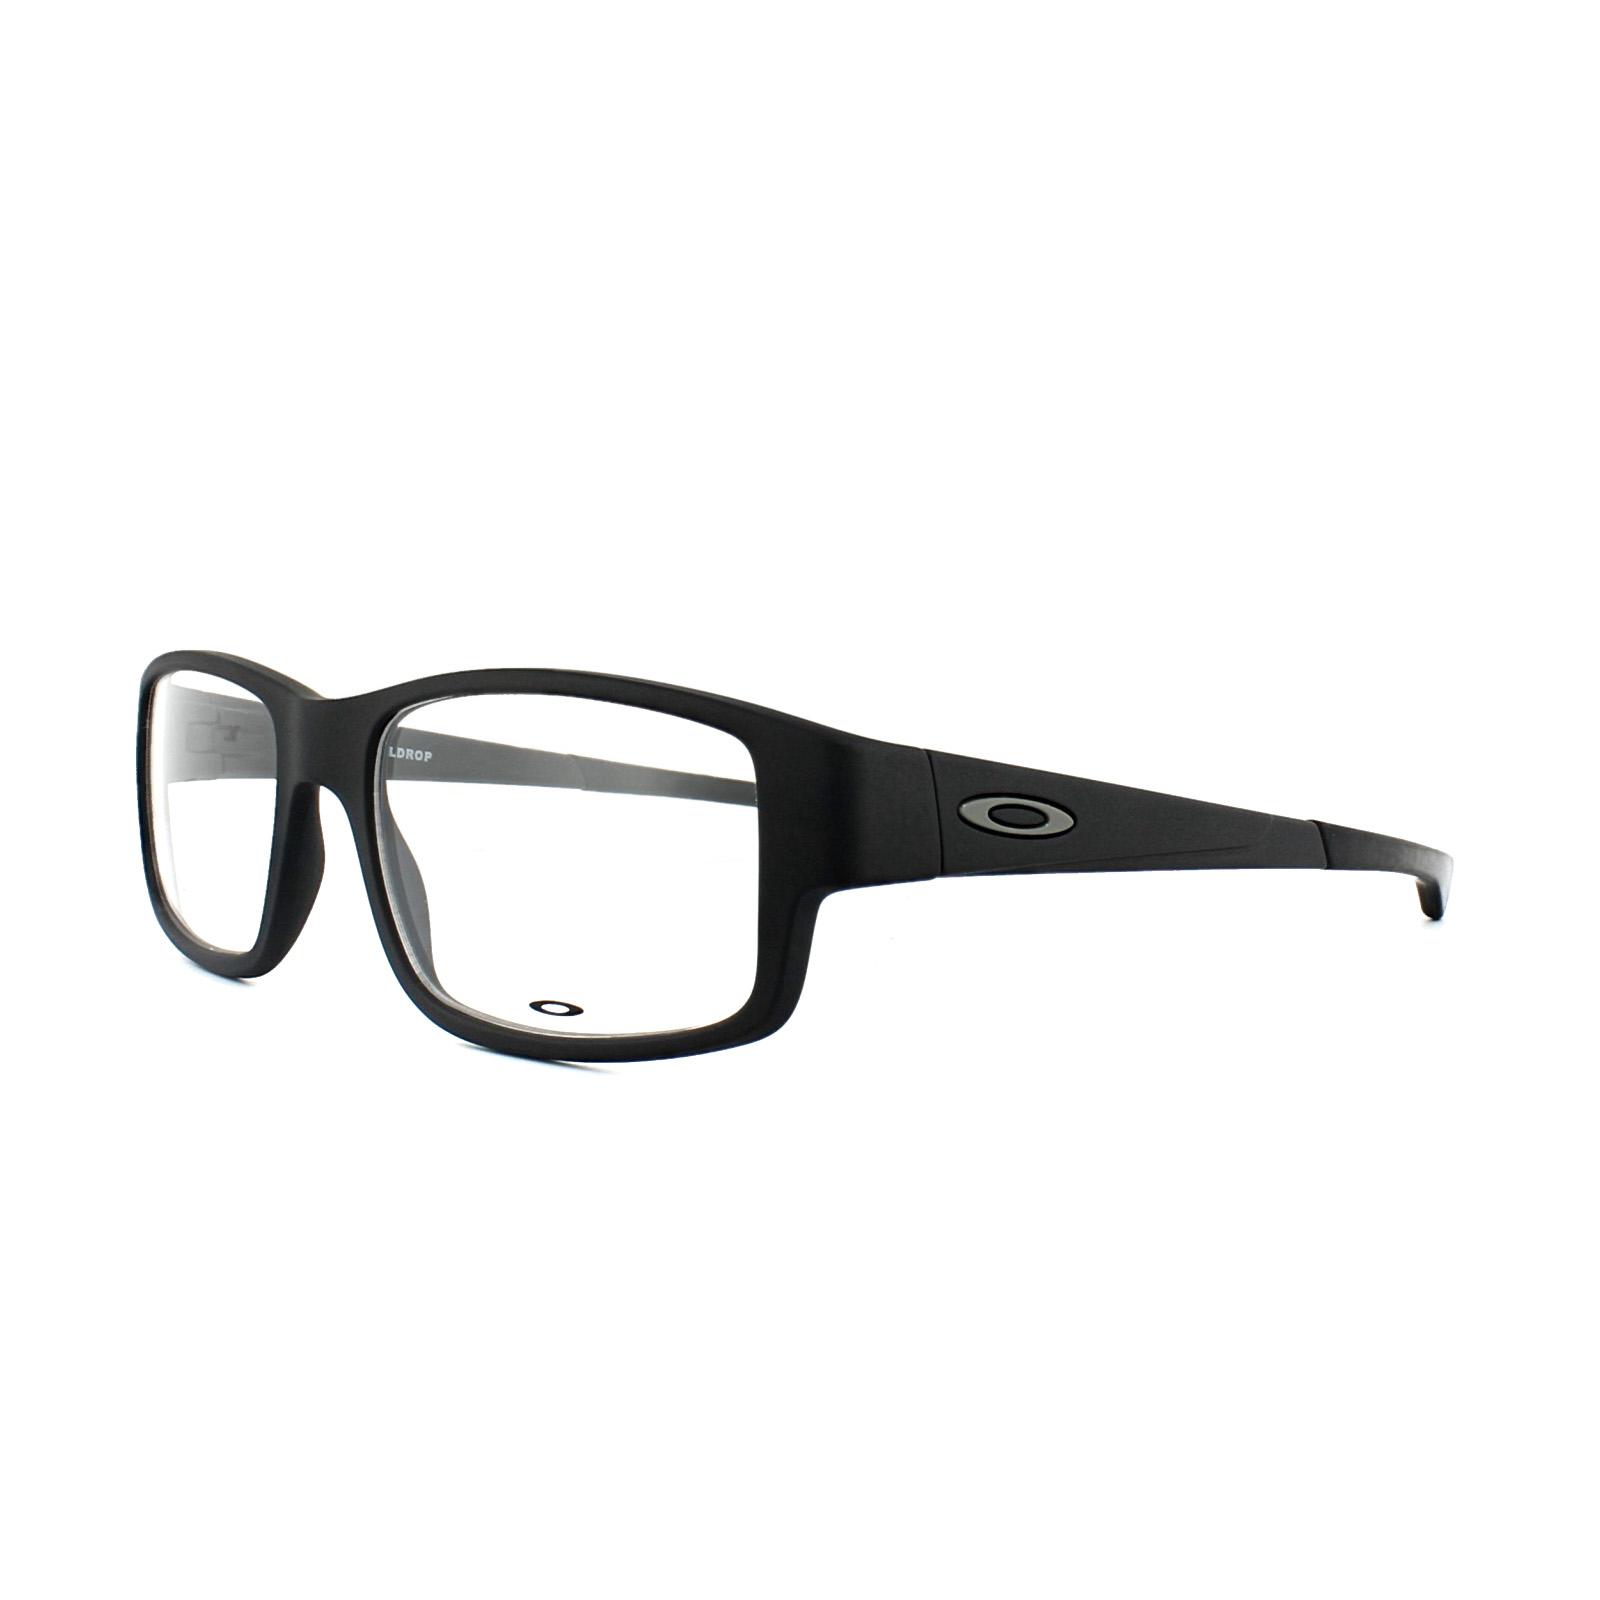 7c379552dfd51 Oakley Glasses Frames Taildrop OX8104-01 Satin Black 888392216328